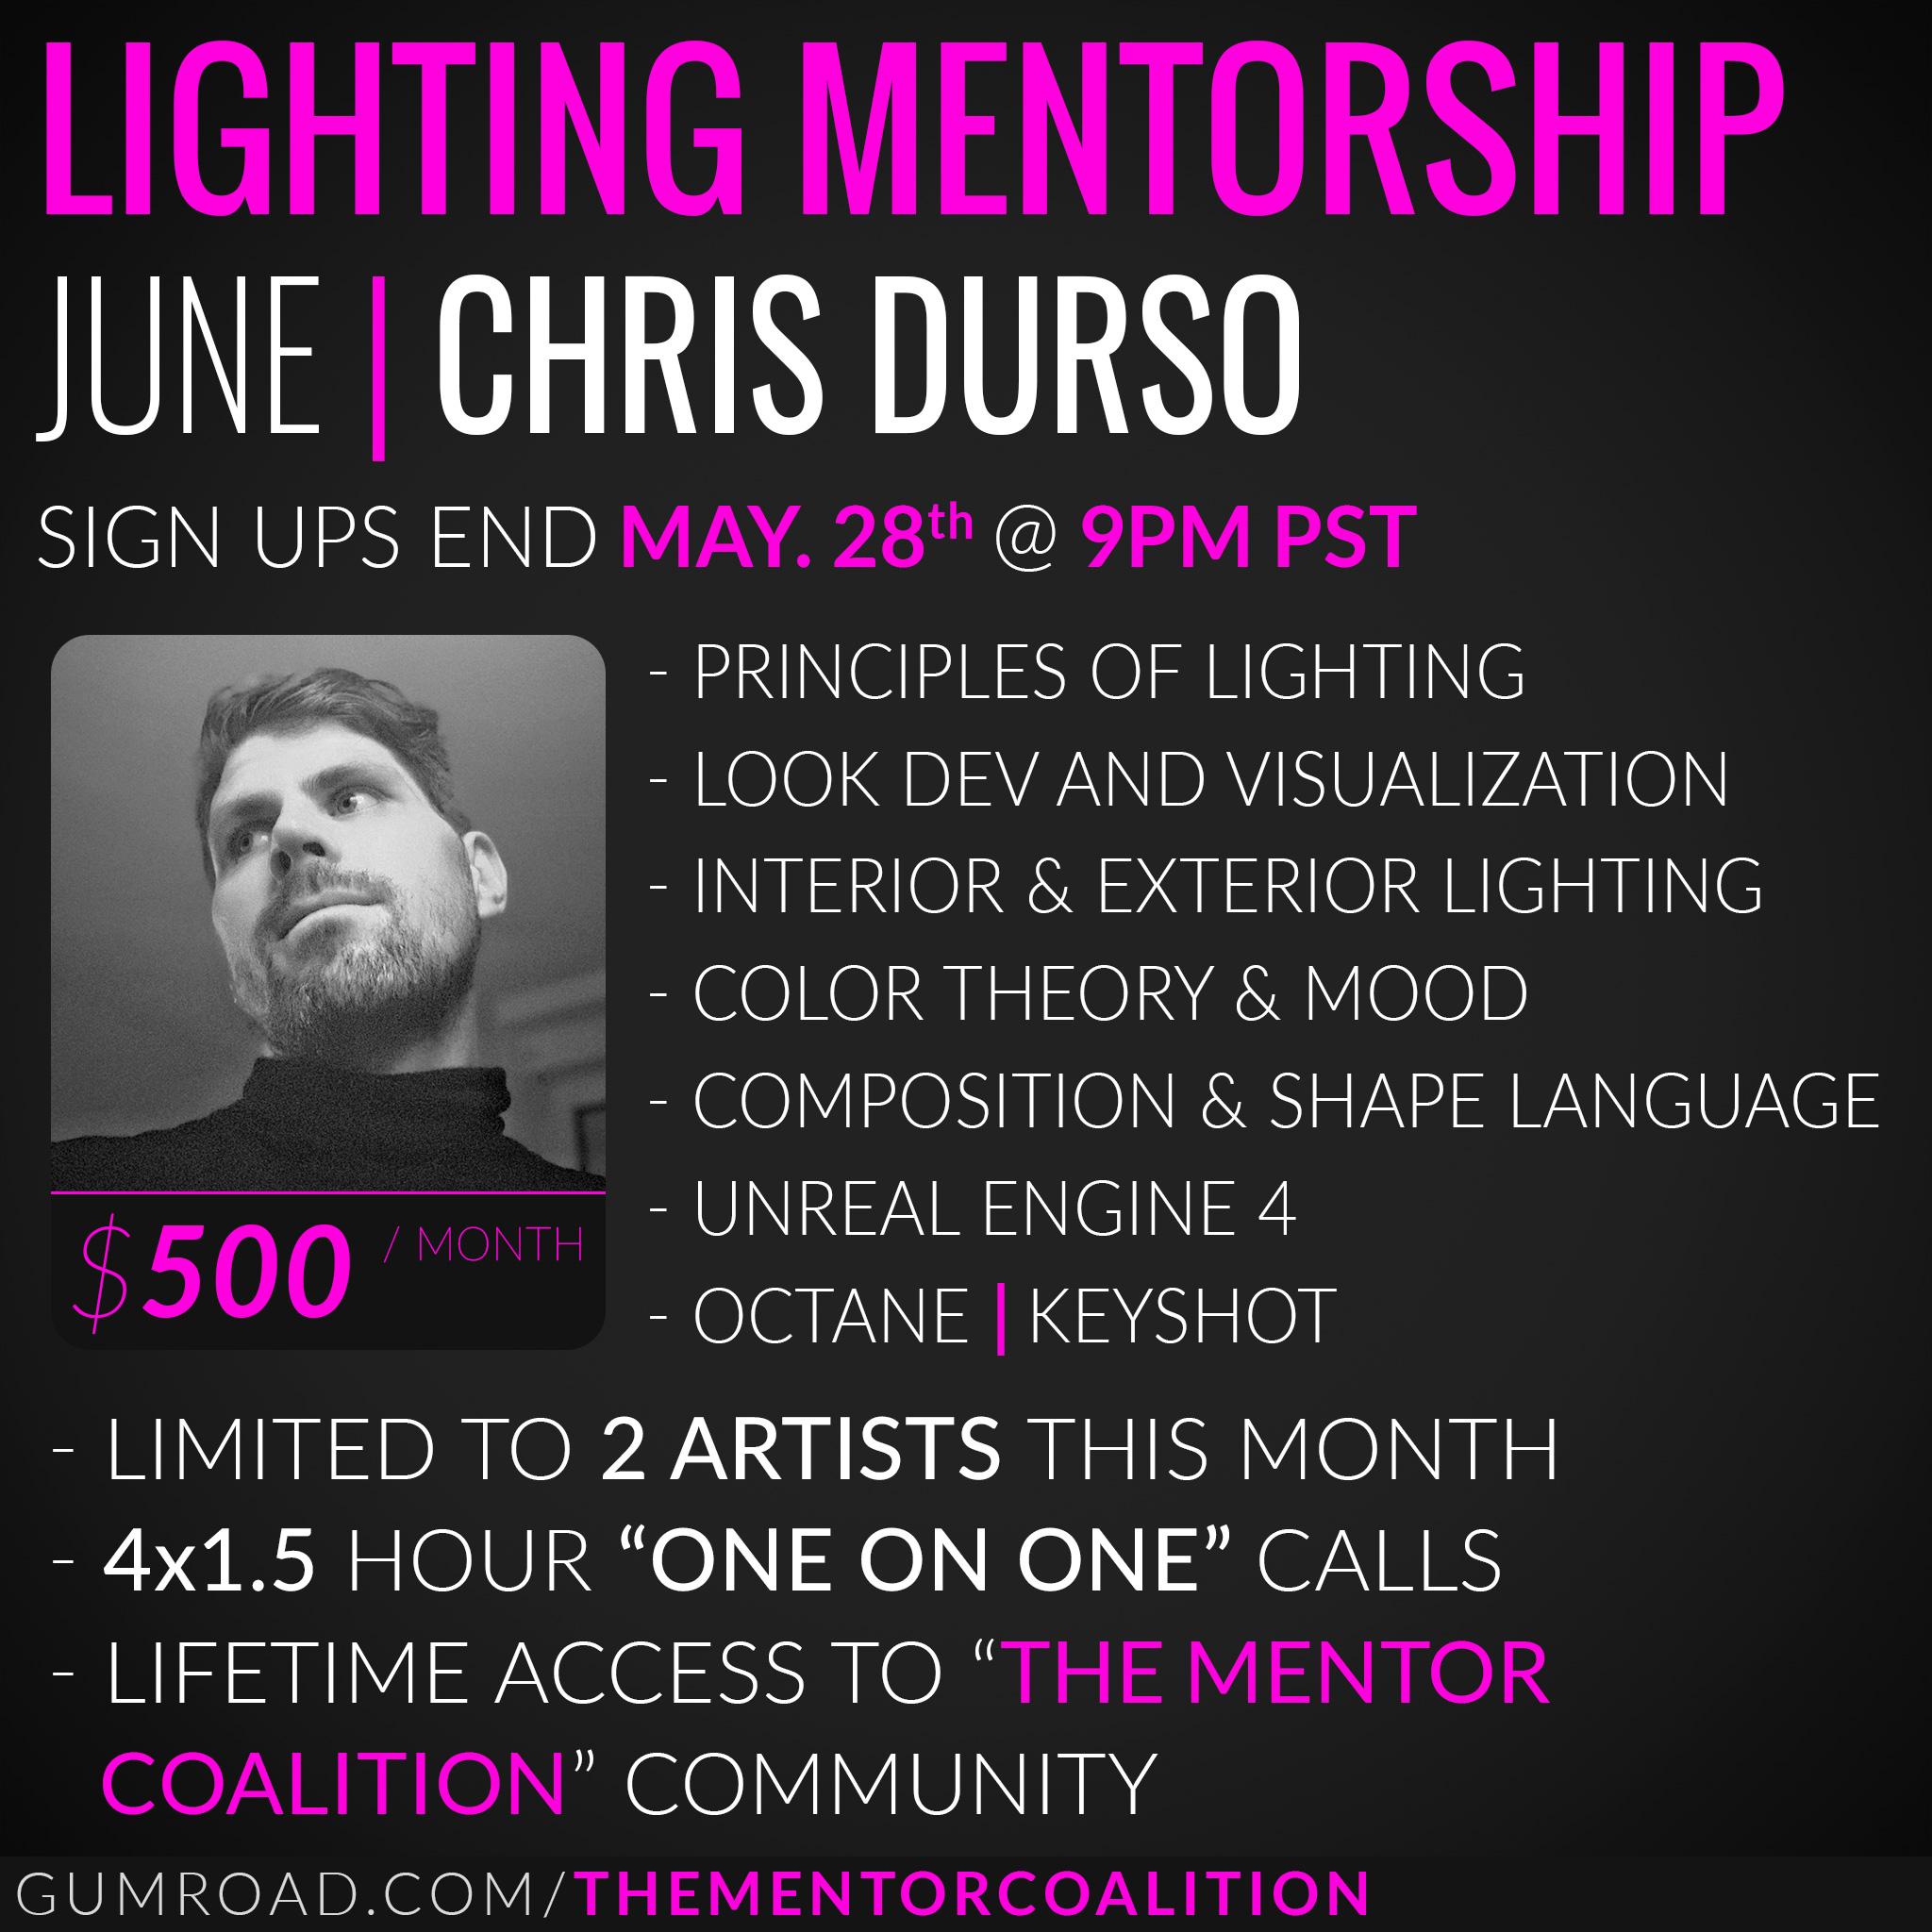 mentor_collective_mentorship_square_lighting_durso.jpg